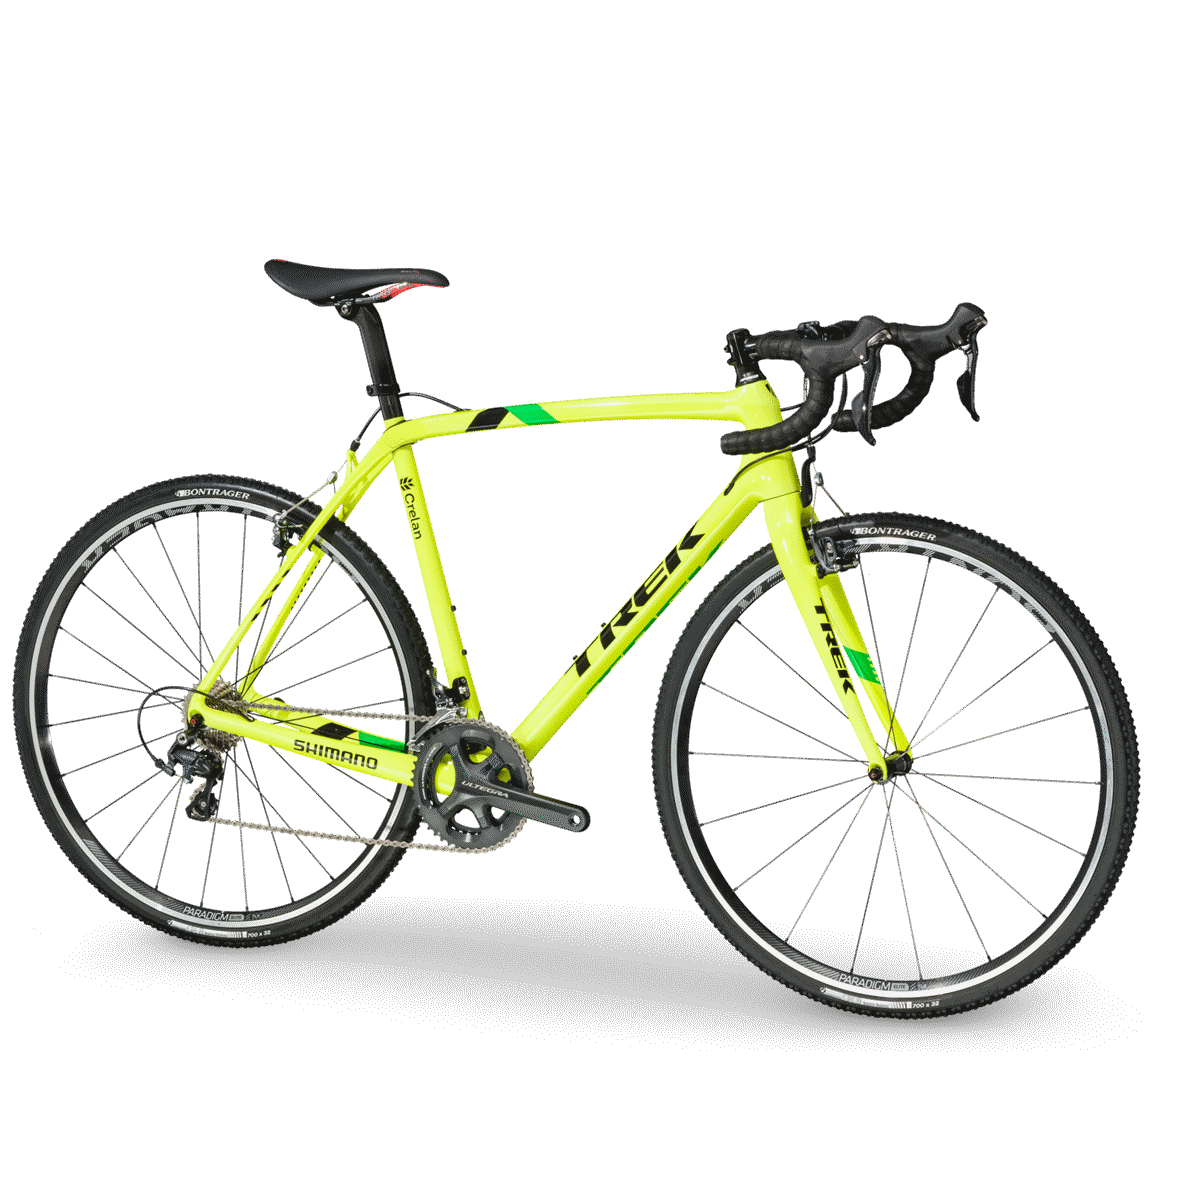 boone cyclocross bikes road bikes bikes trek bikes. Black Bedroom Furniture Sets. Home Design Ideas